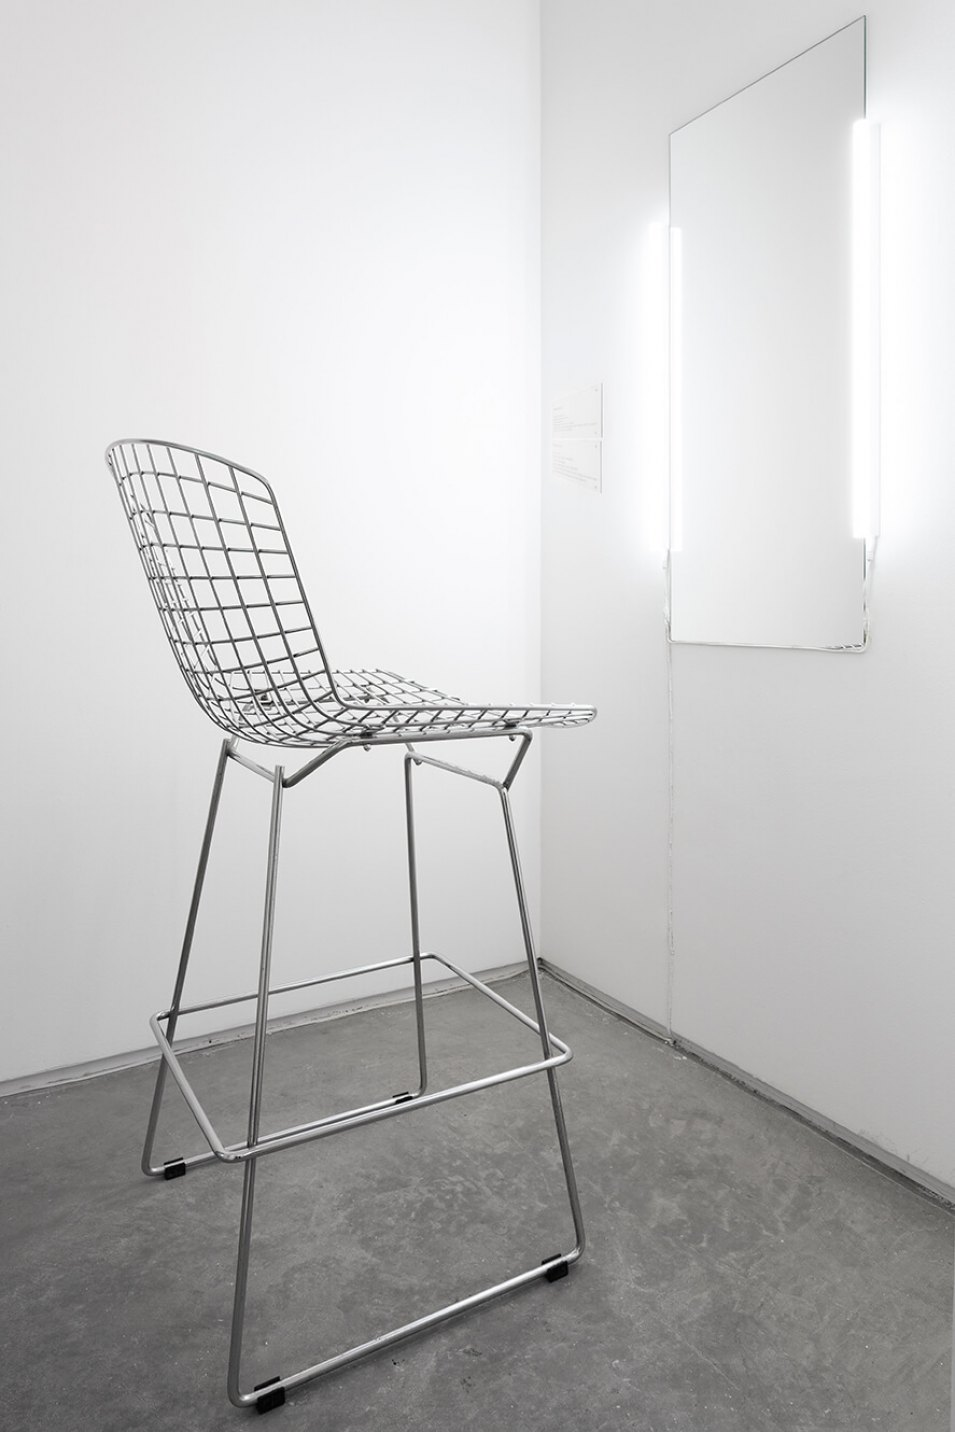 Cibelle Cavalli Bastos,<em>SELF.i.e.</em>, 2016, mirror, lamps and chair, variable dimensions - Mendes Wood DM